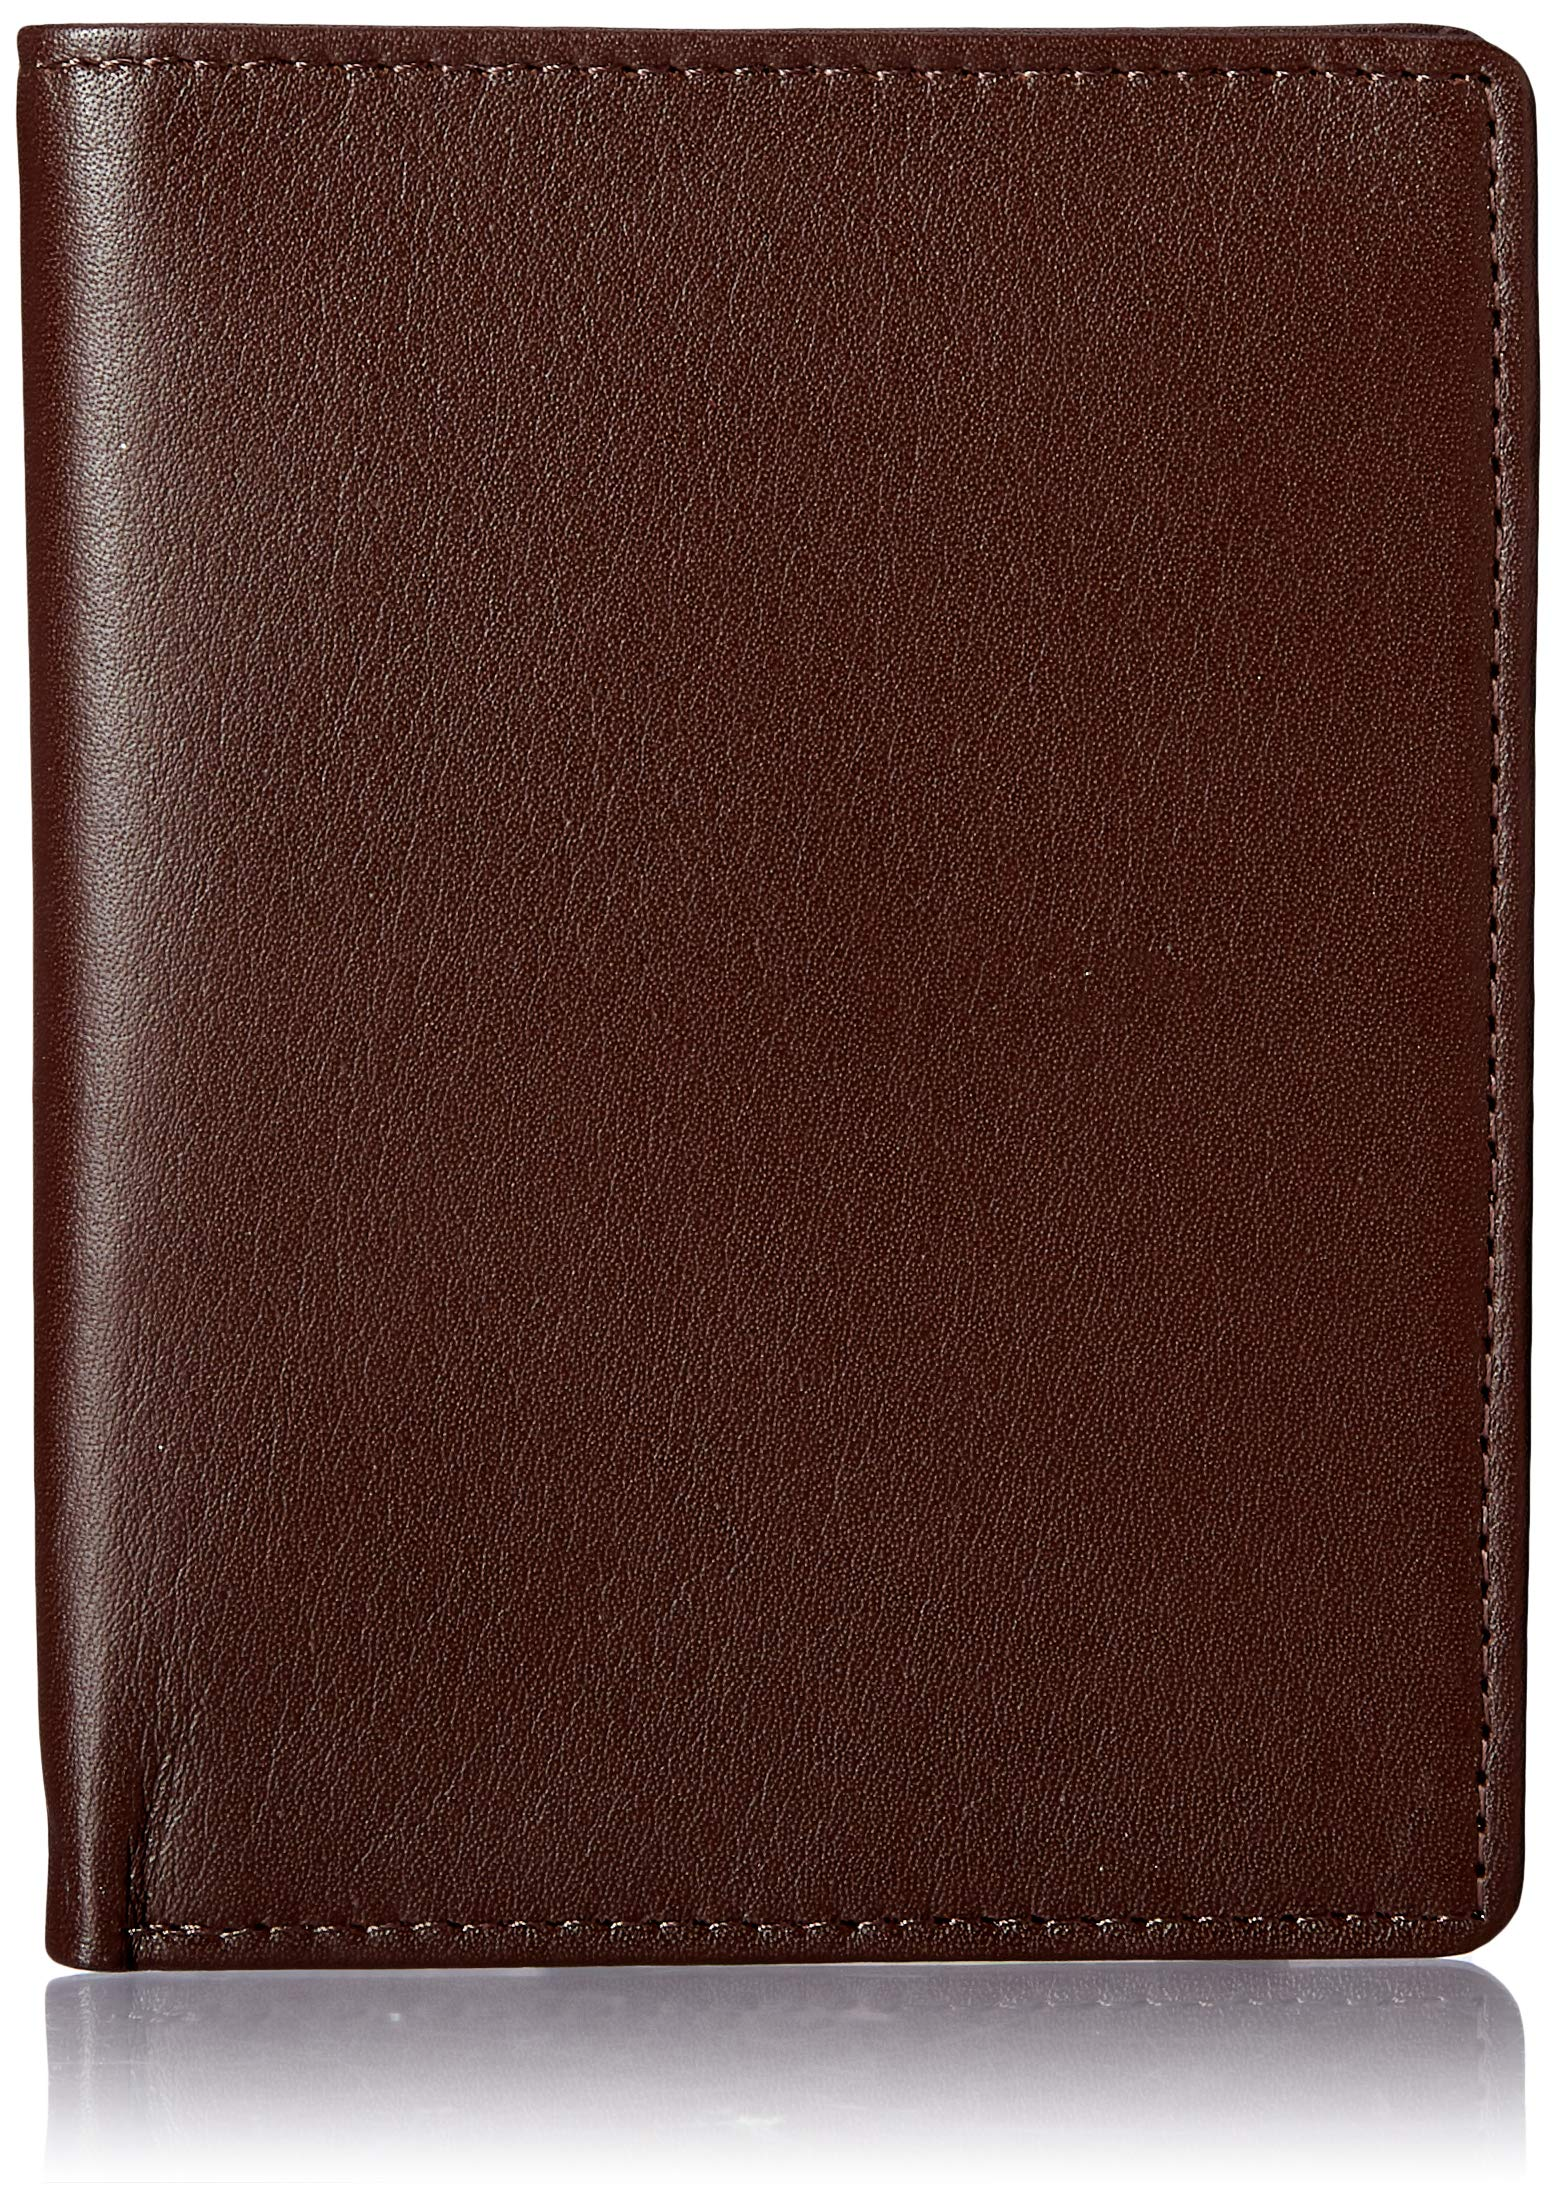 Royce Leather RFID Blocking Bifold Passport Currency Travel Wallet, Brown